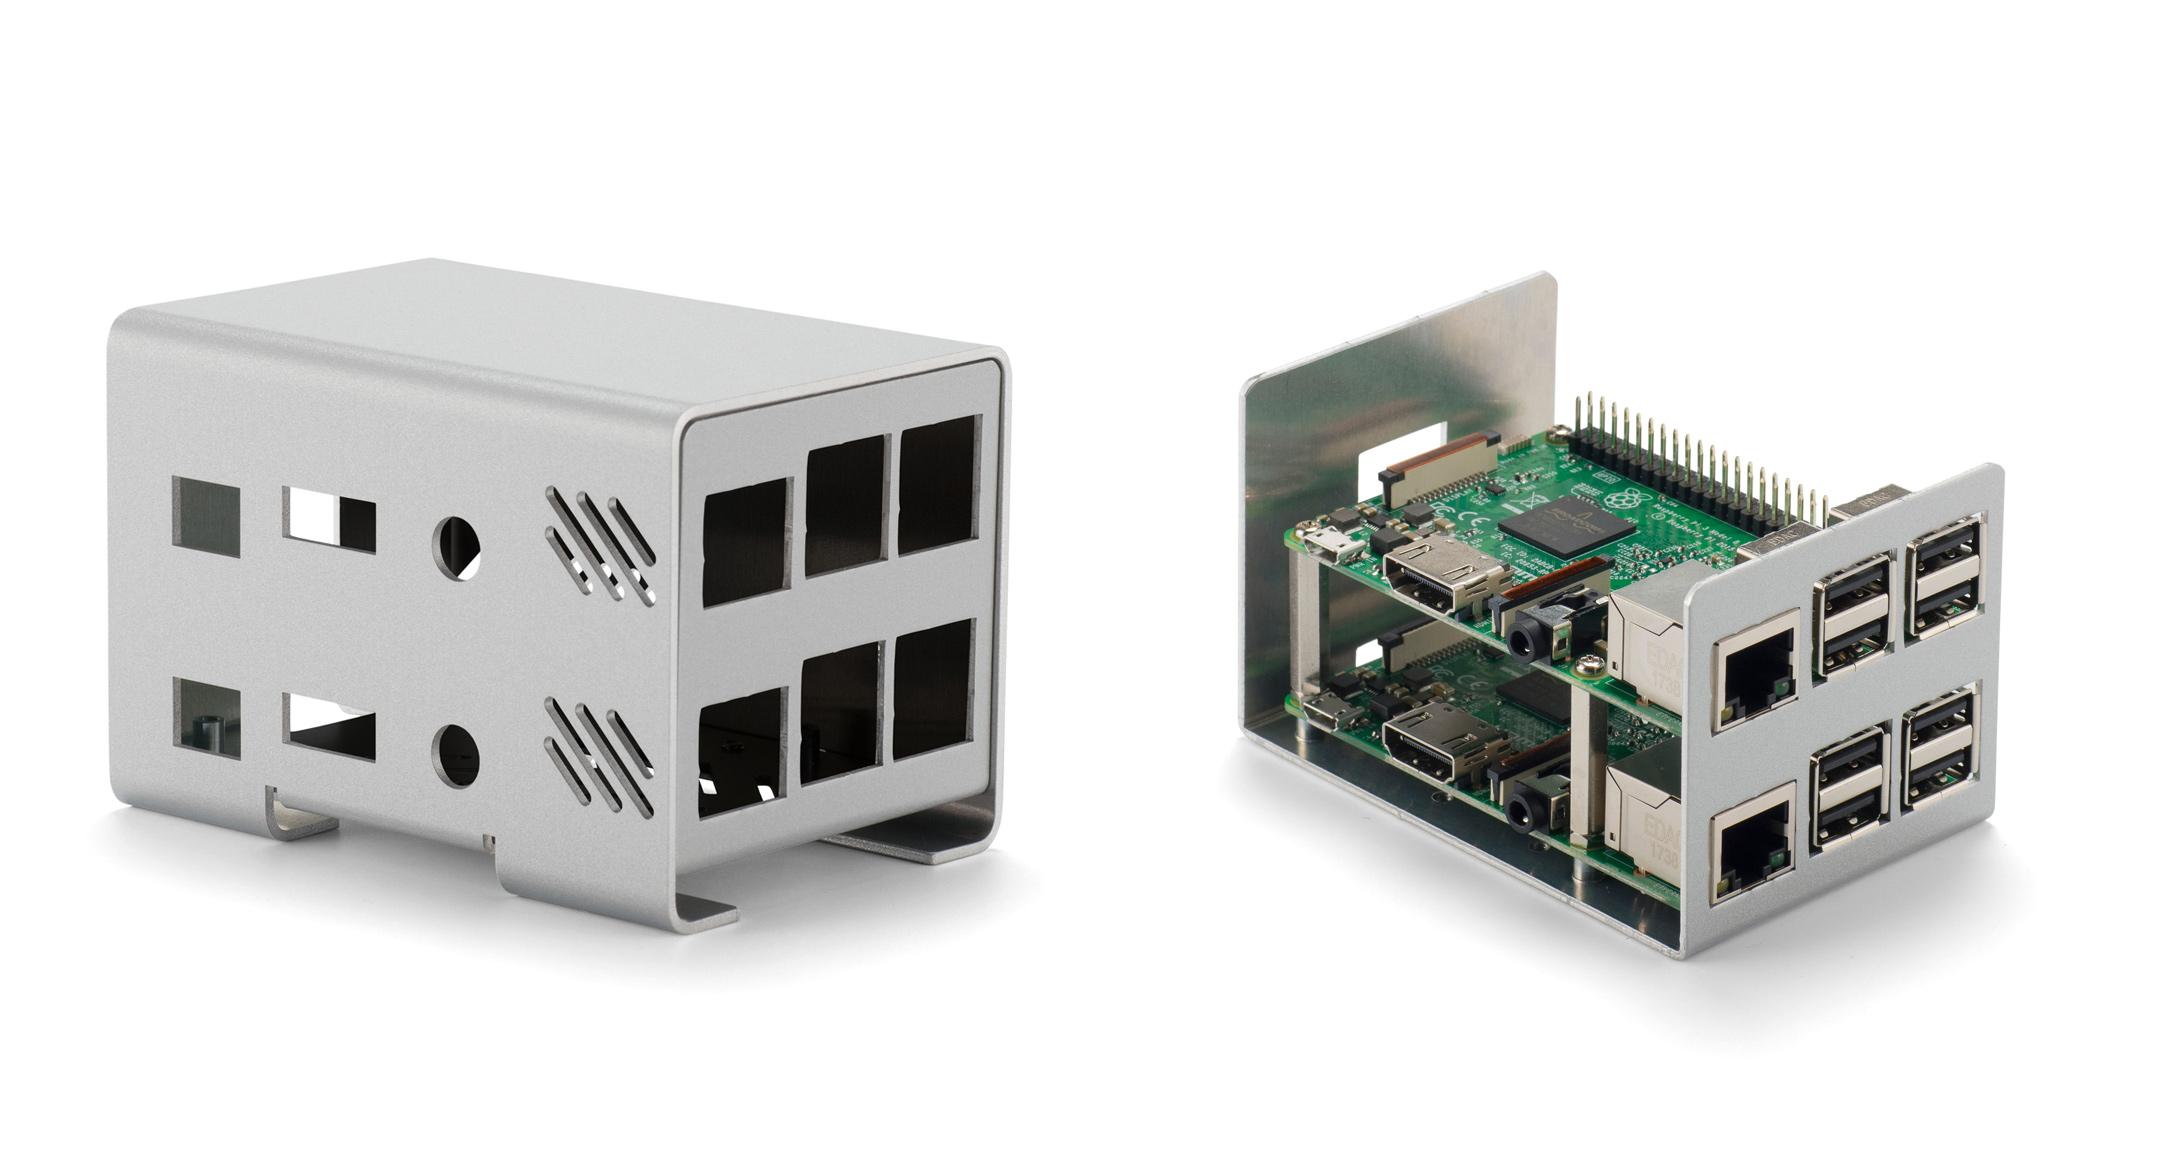 Raspberry Pi ケース アルミ製 2B/3B用 RPIシリーズの画像